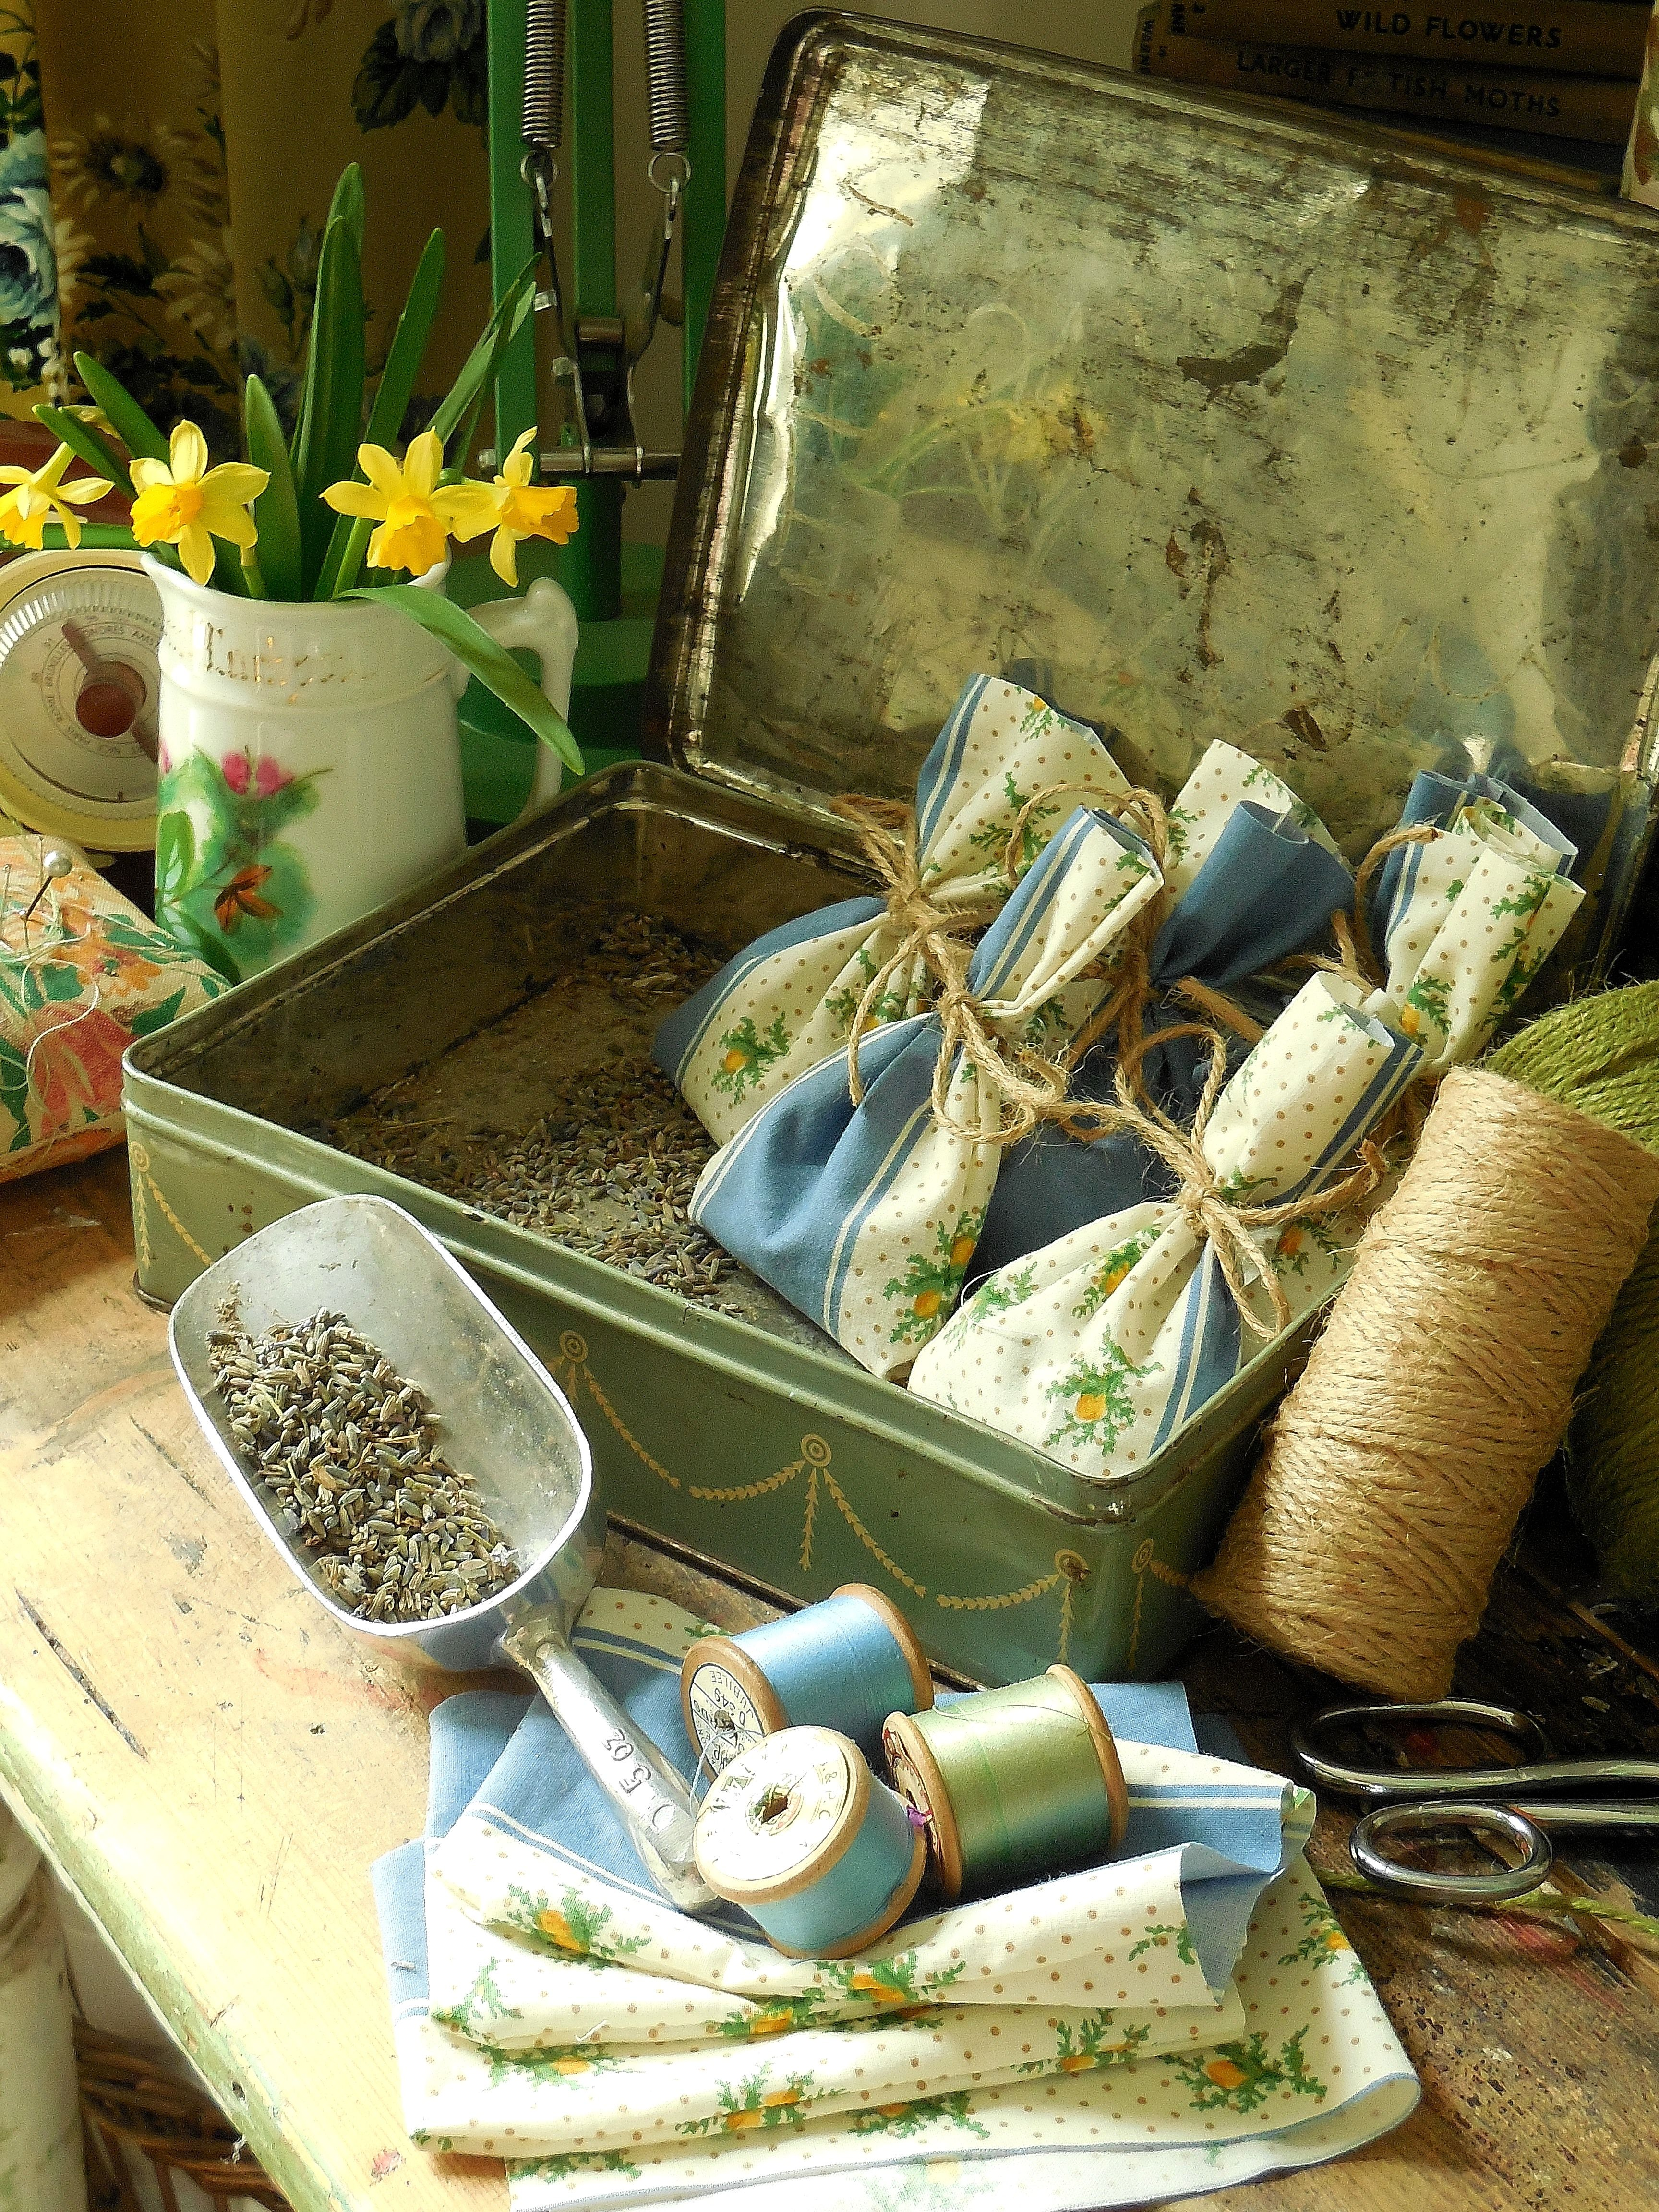 Making lavender bags